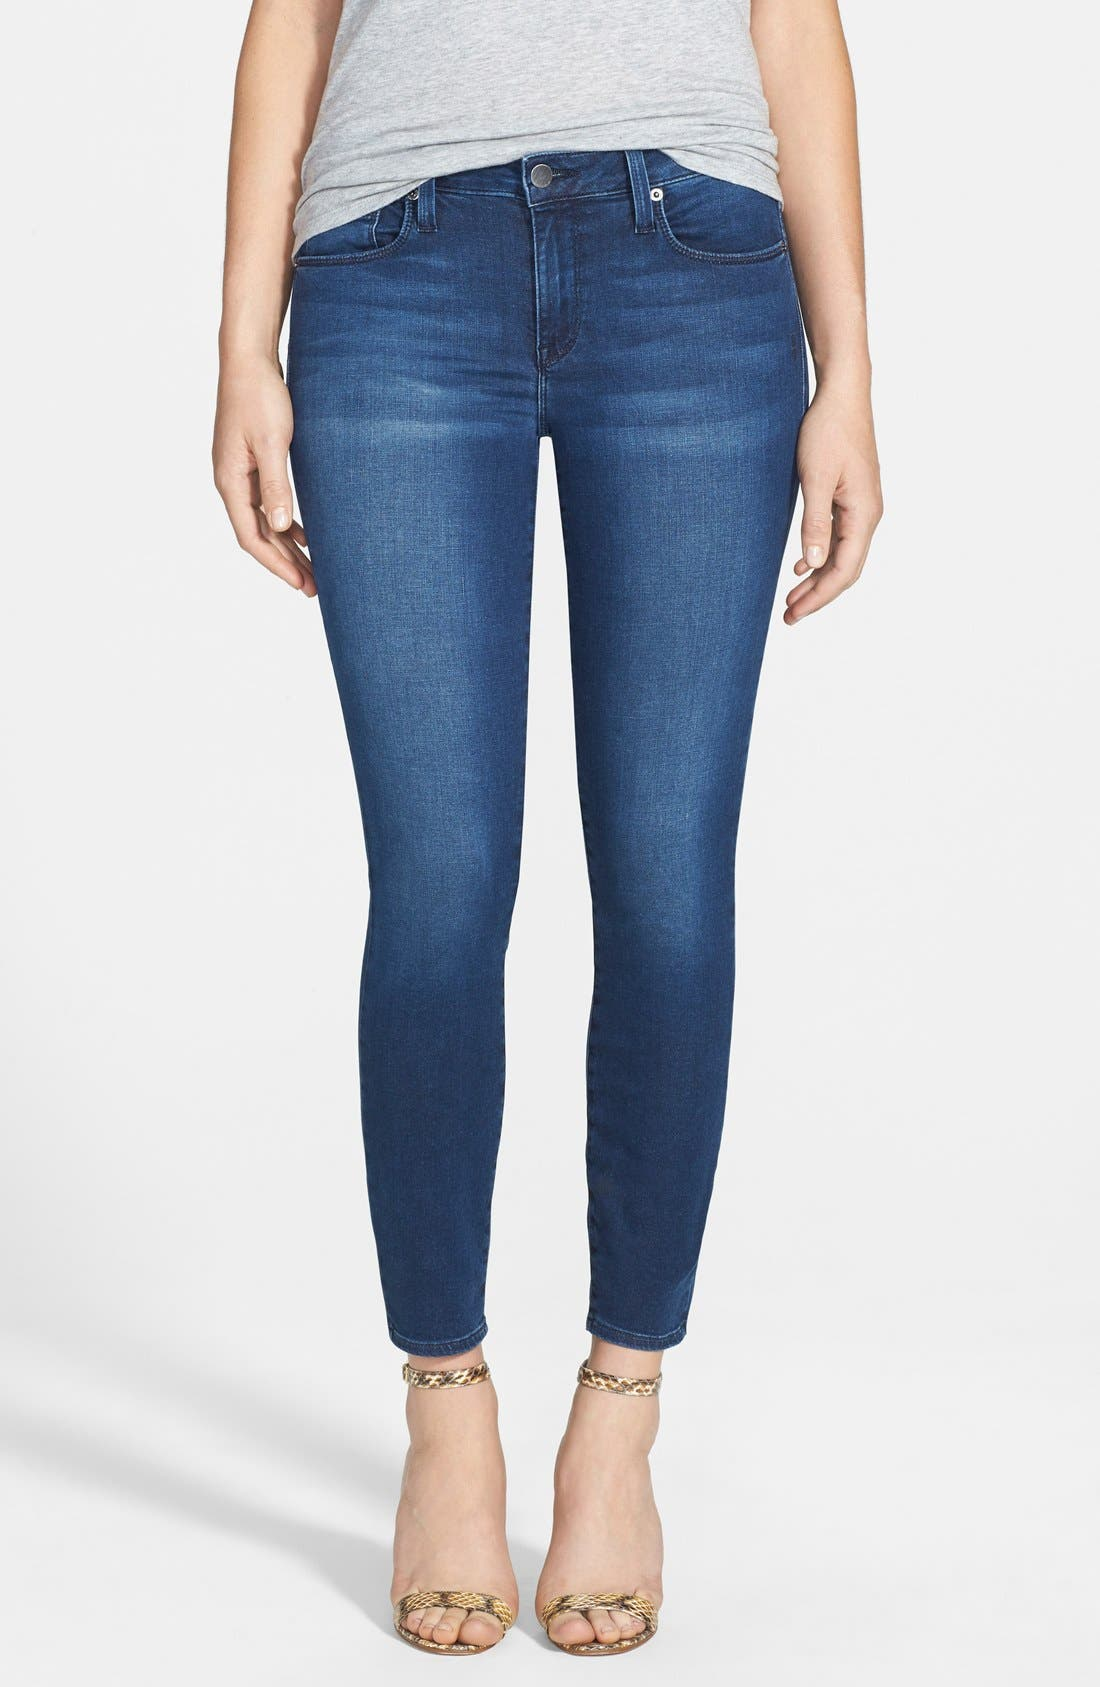 Main Image - Genetic 'Brooke' Crop Skinny Jeans (Riot)